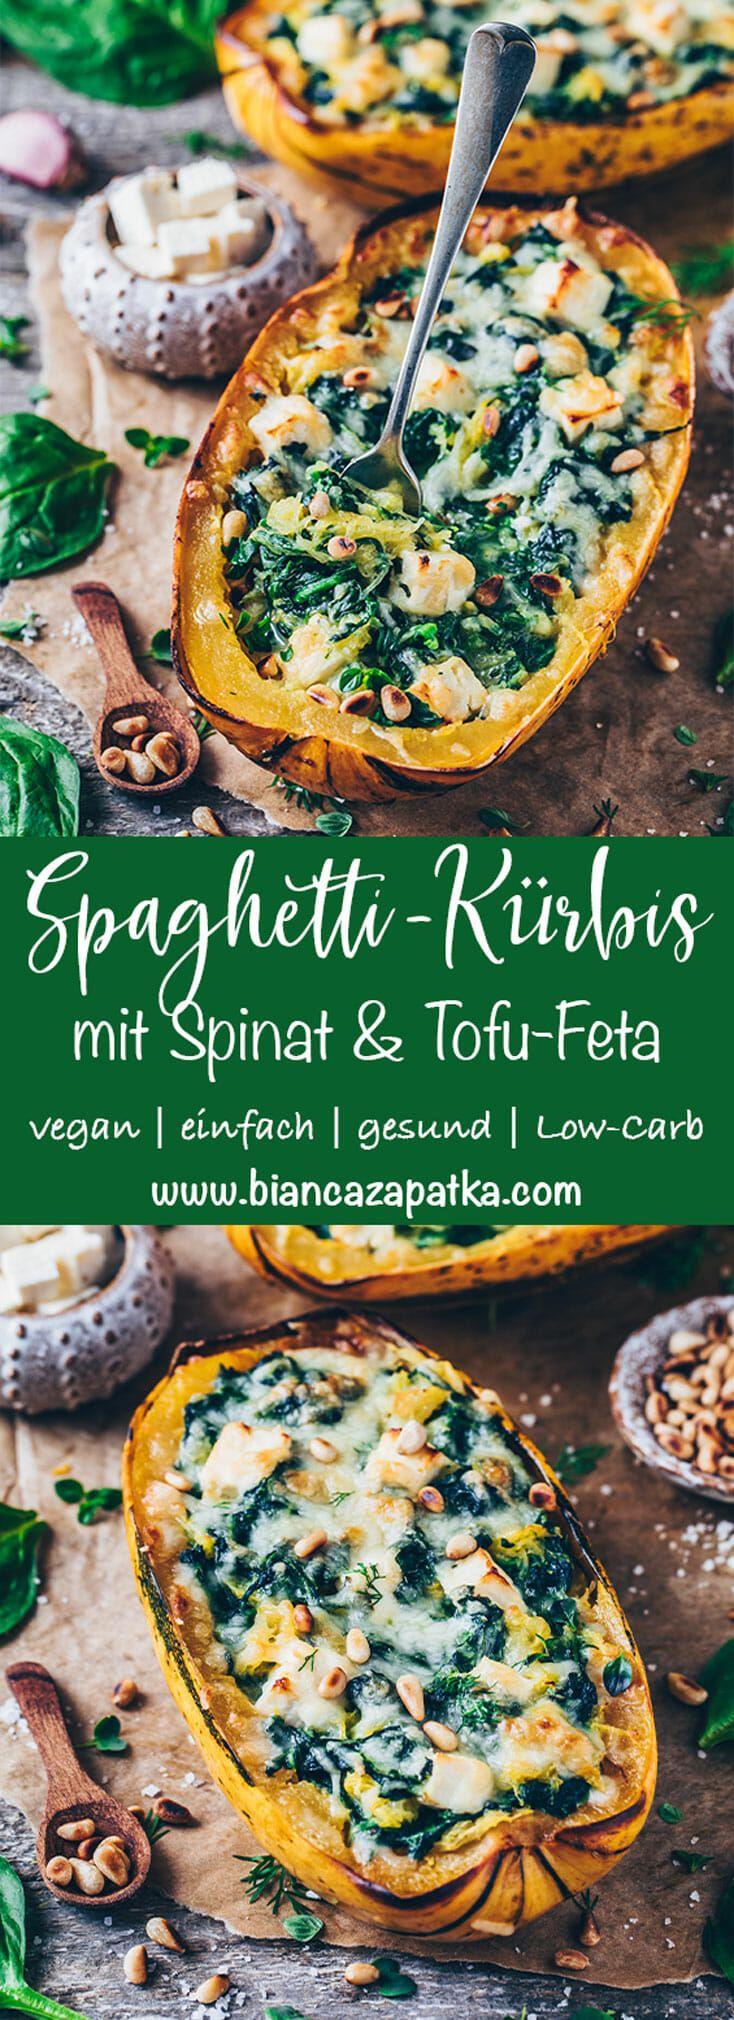 Spaghetti-Kürbis mit Spinat und Feta | Vegan - Bianca Zapatka | Rezepte